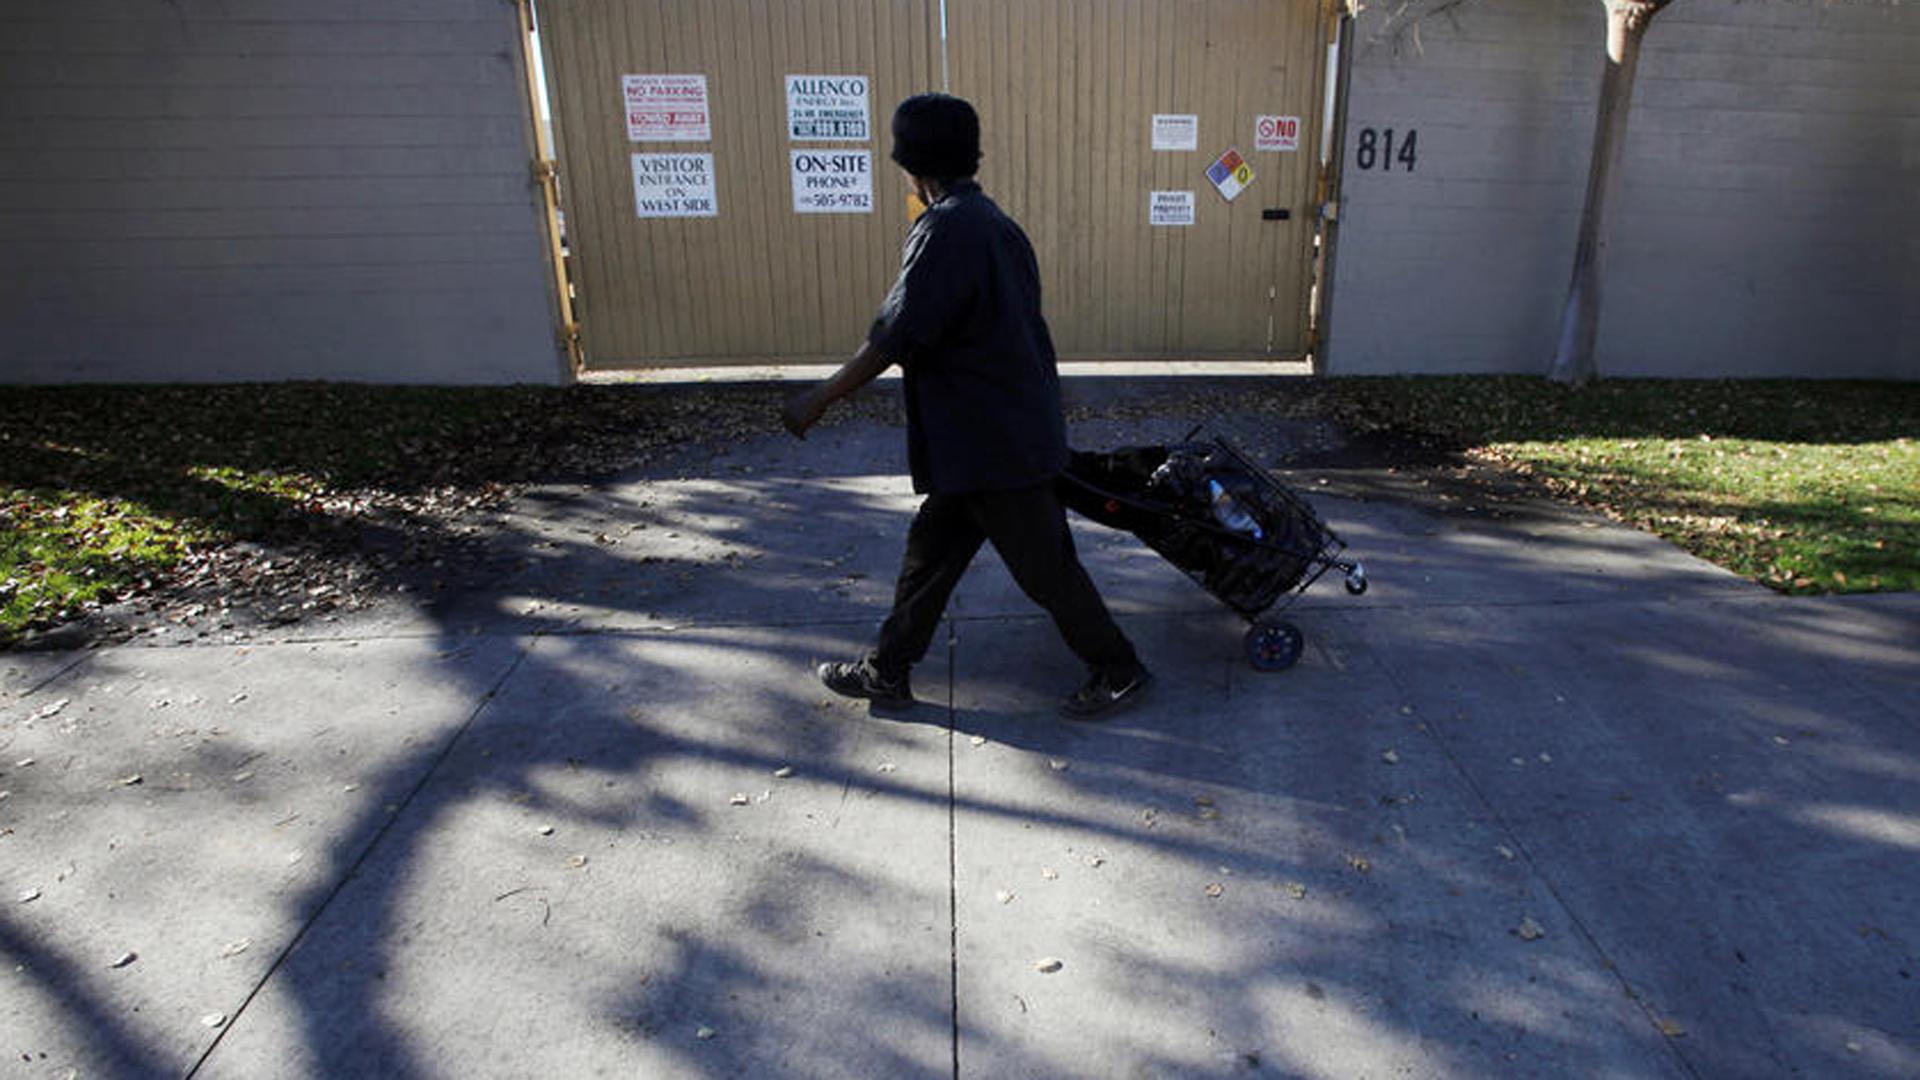 The Allenco Energy Co. site in University Park. (Credit: Francine Orr / Los Angeles Times)